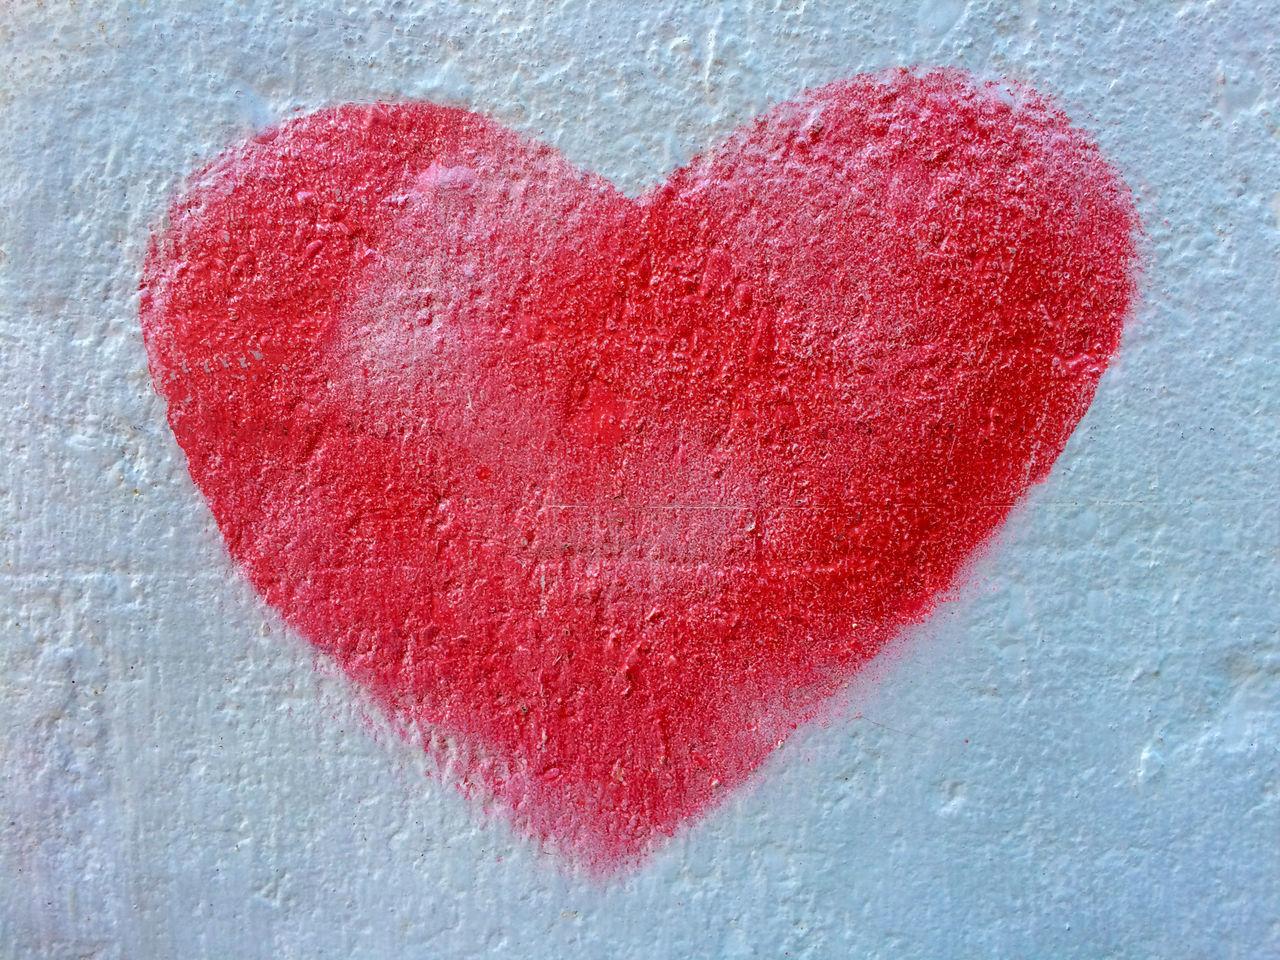 Close-up Graffiti Heart Heart Shape Heart ❤ Love No People Red Romance Stencil Stencil Art Street Art Structure Symbol